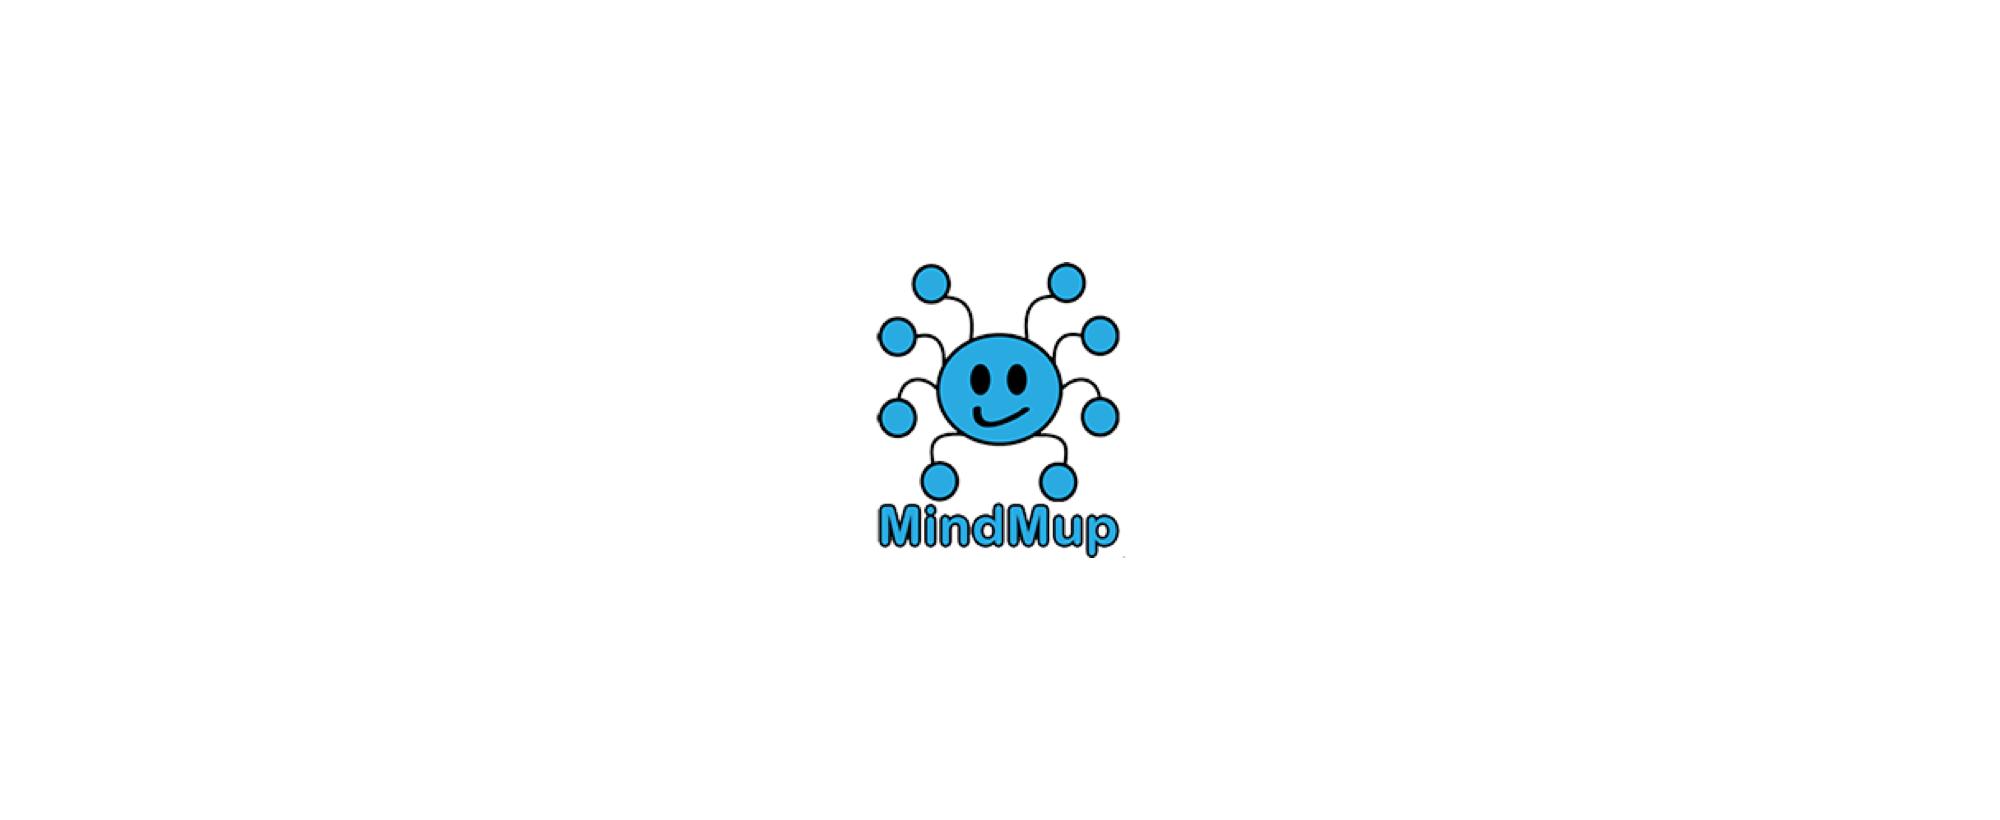 mindmup serverless